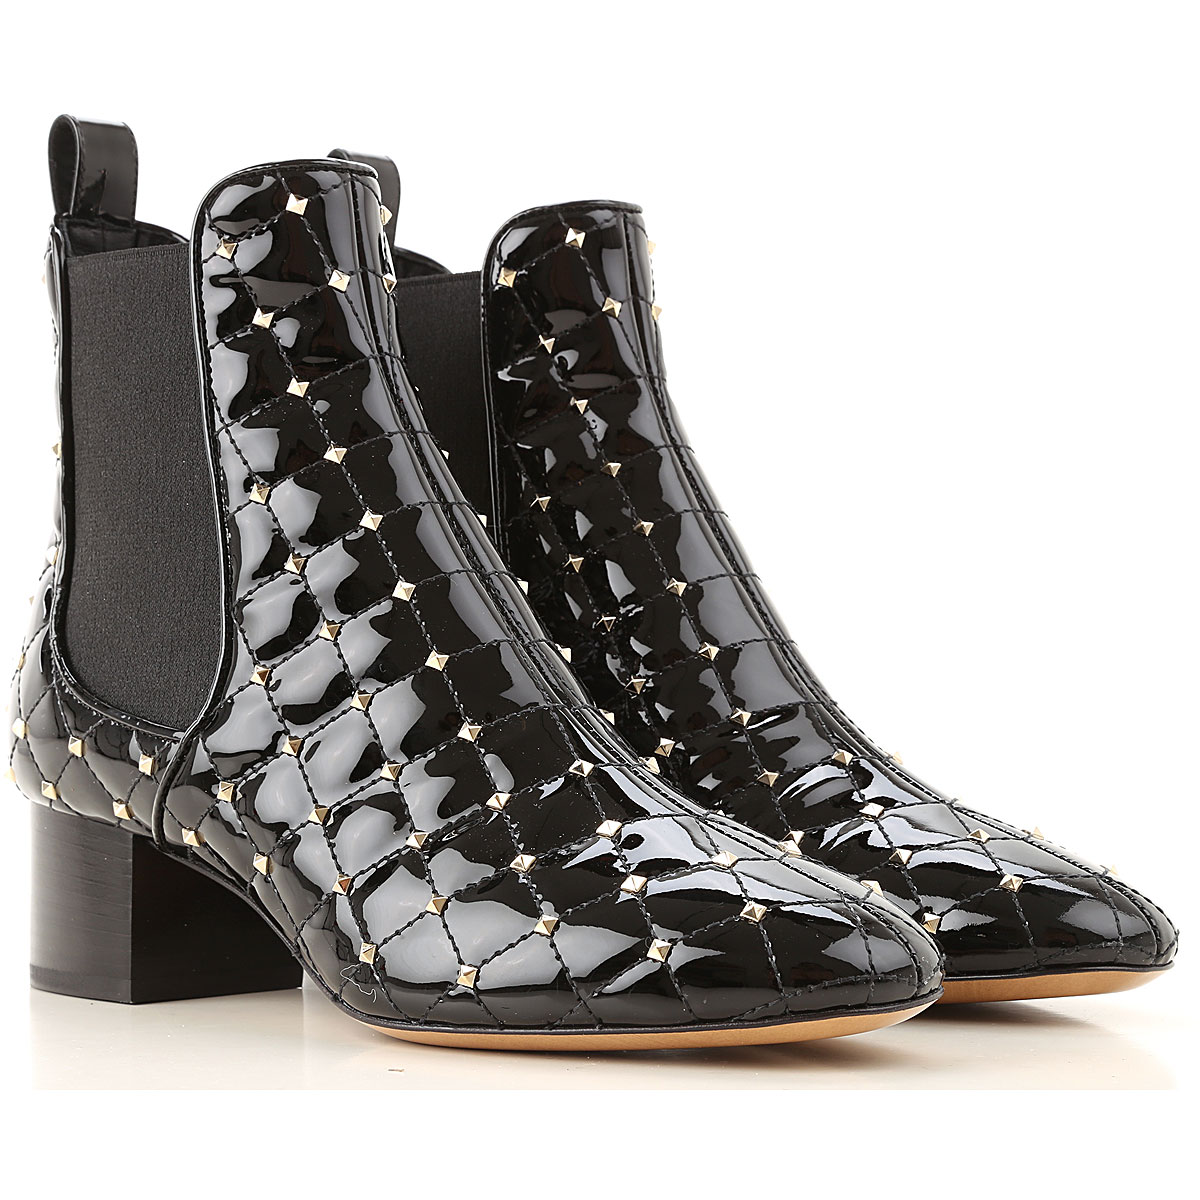 Valentino Garavani Chelsea Boots for Women On Sale, Black, Leather, 2019, 5.5 6 7 8 8.5 9